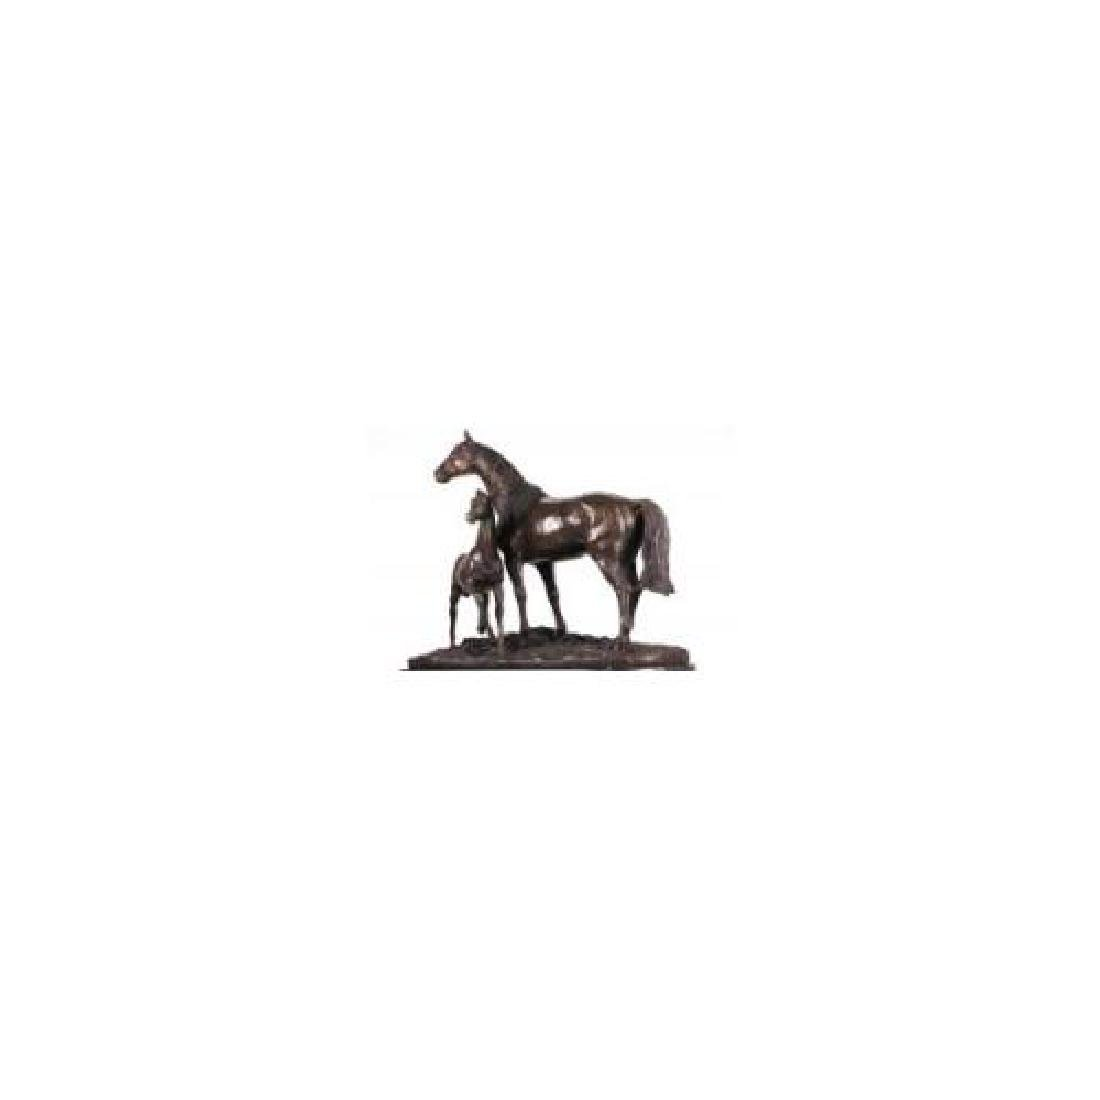 Bronze Horse Sculpture on Marble Base Statue - 6